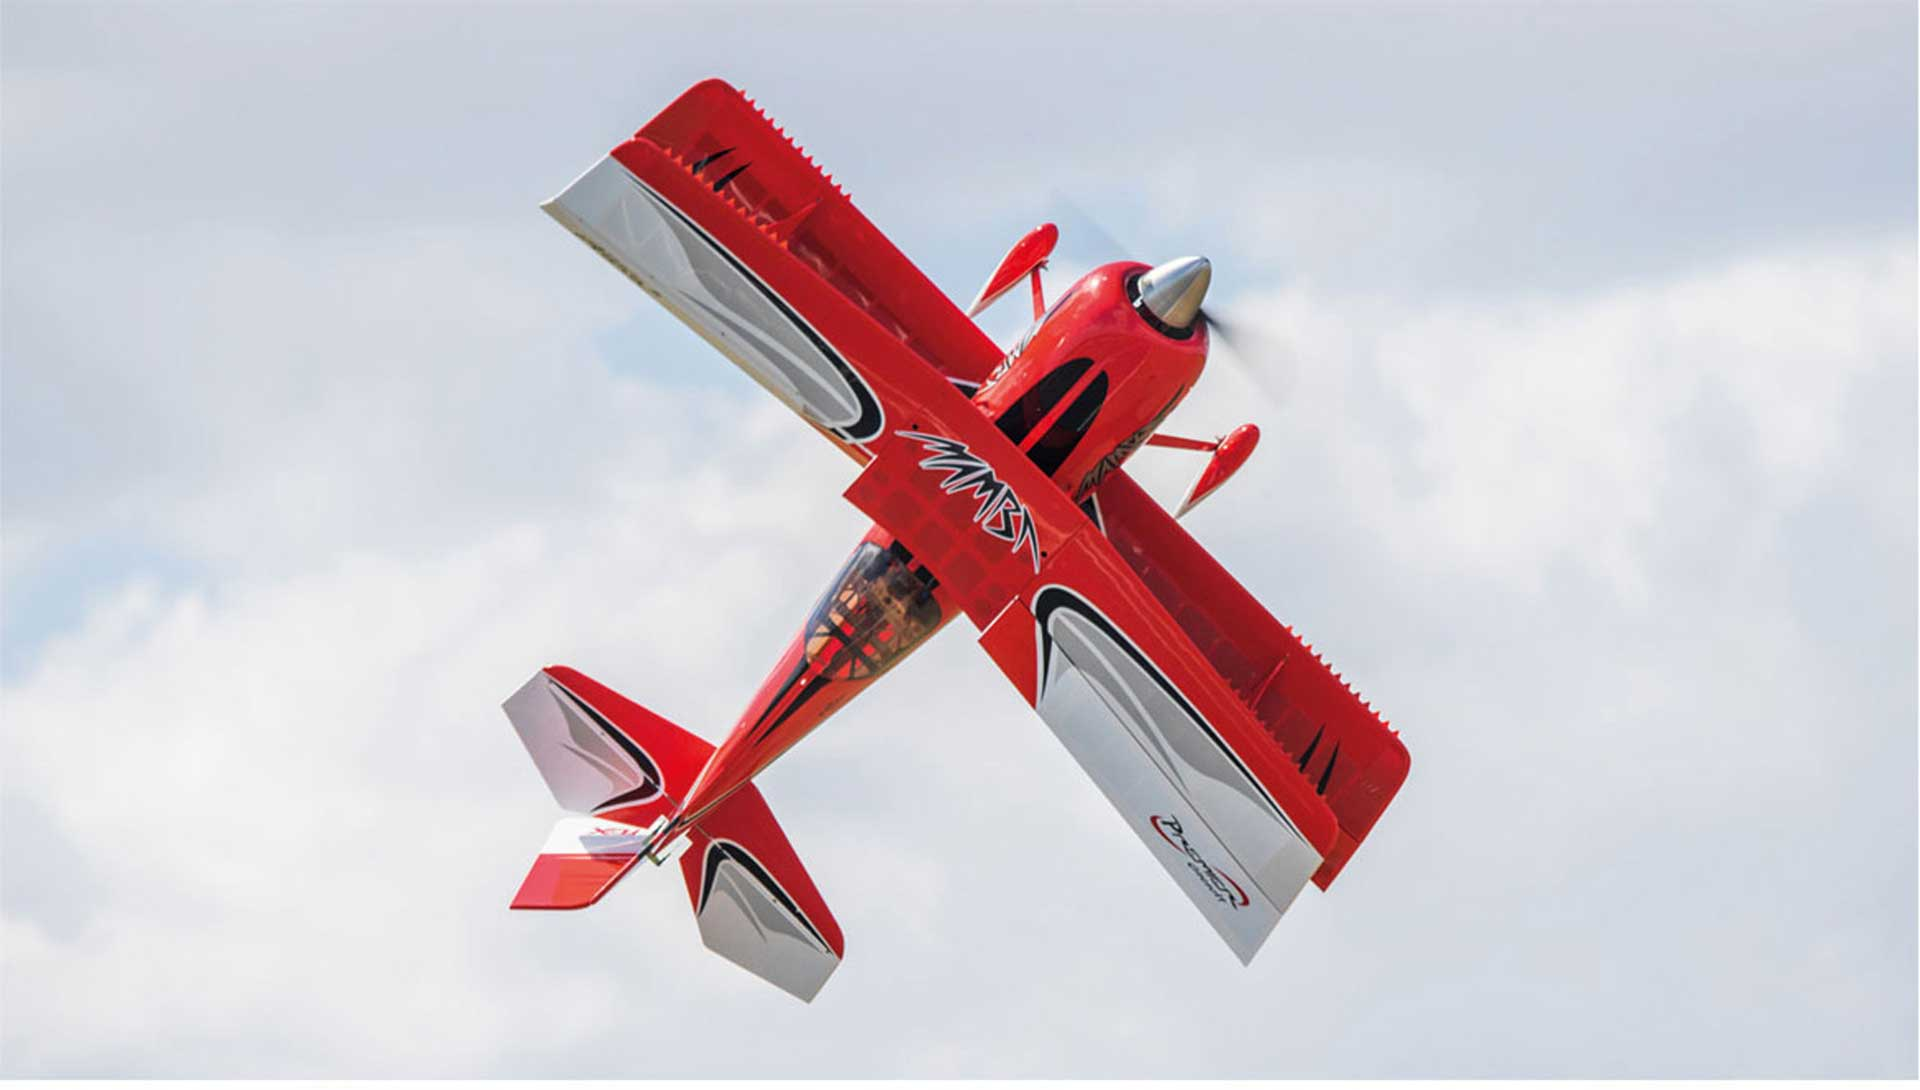 PREMIER AIRCRAFT MAMBA 70CC ARFSV RED BIPLAN WITH SERVOS DIGITAL HV